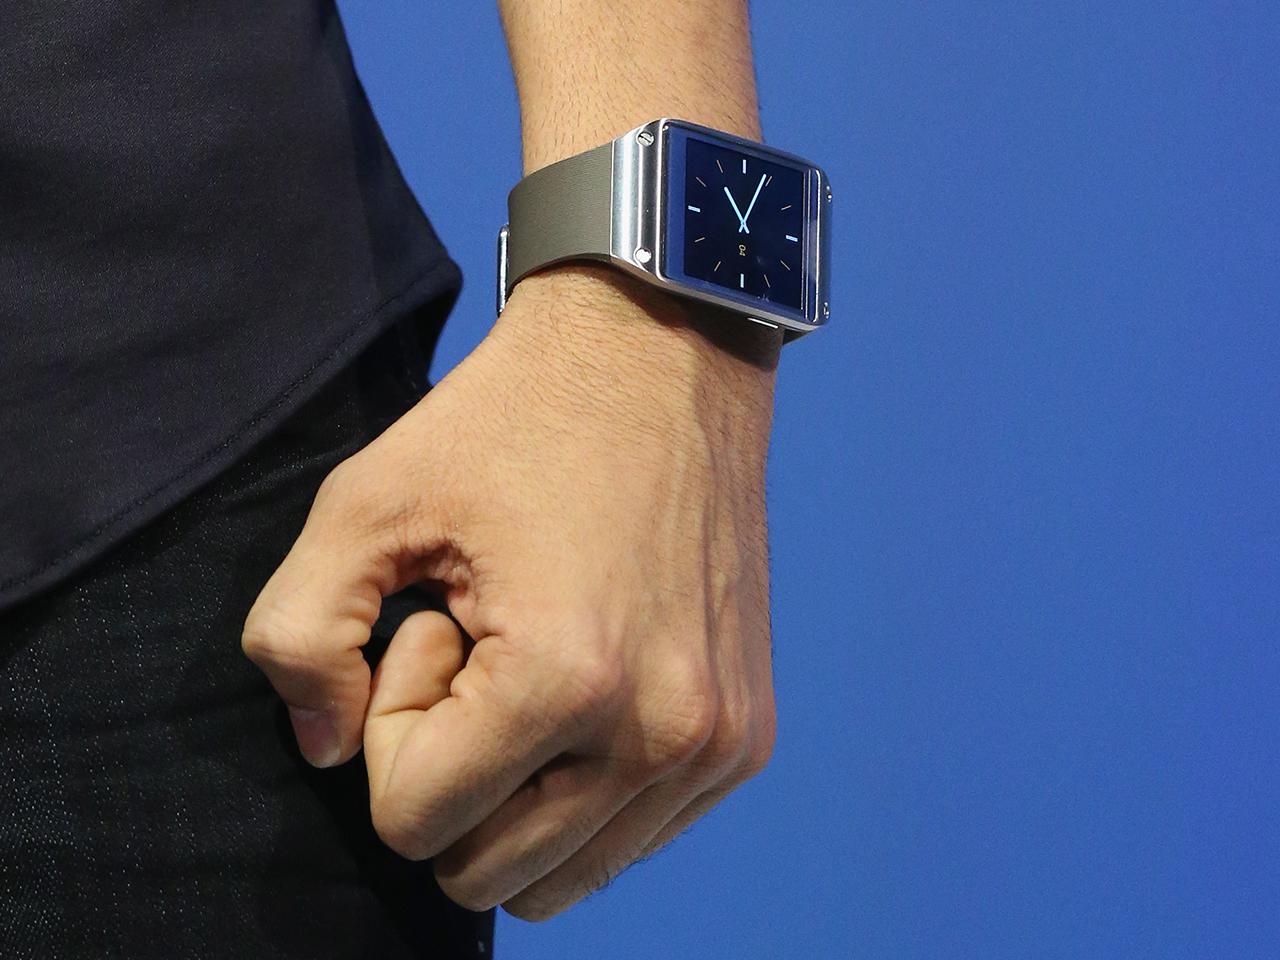 Samsung's Pranav Mistry wearing the new Galaxy Gear smartwatch in Berlin last Wednesday.